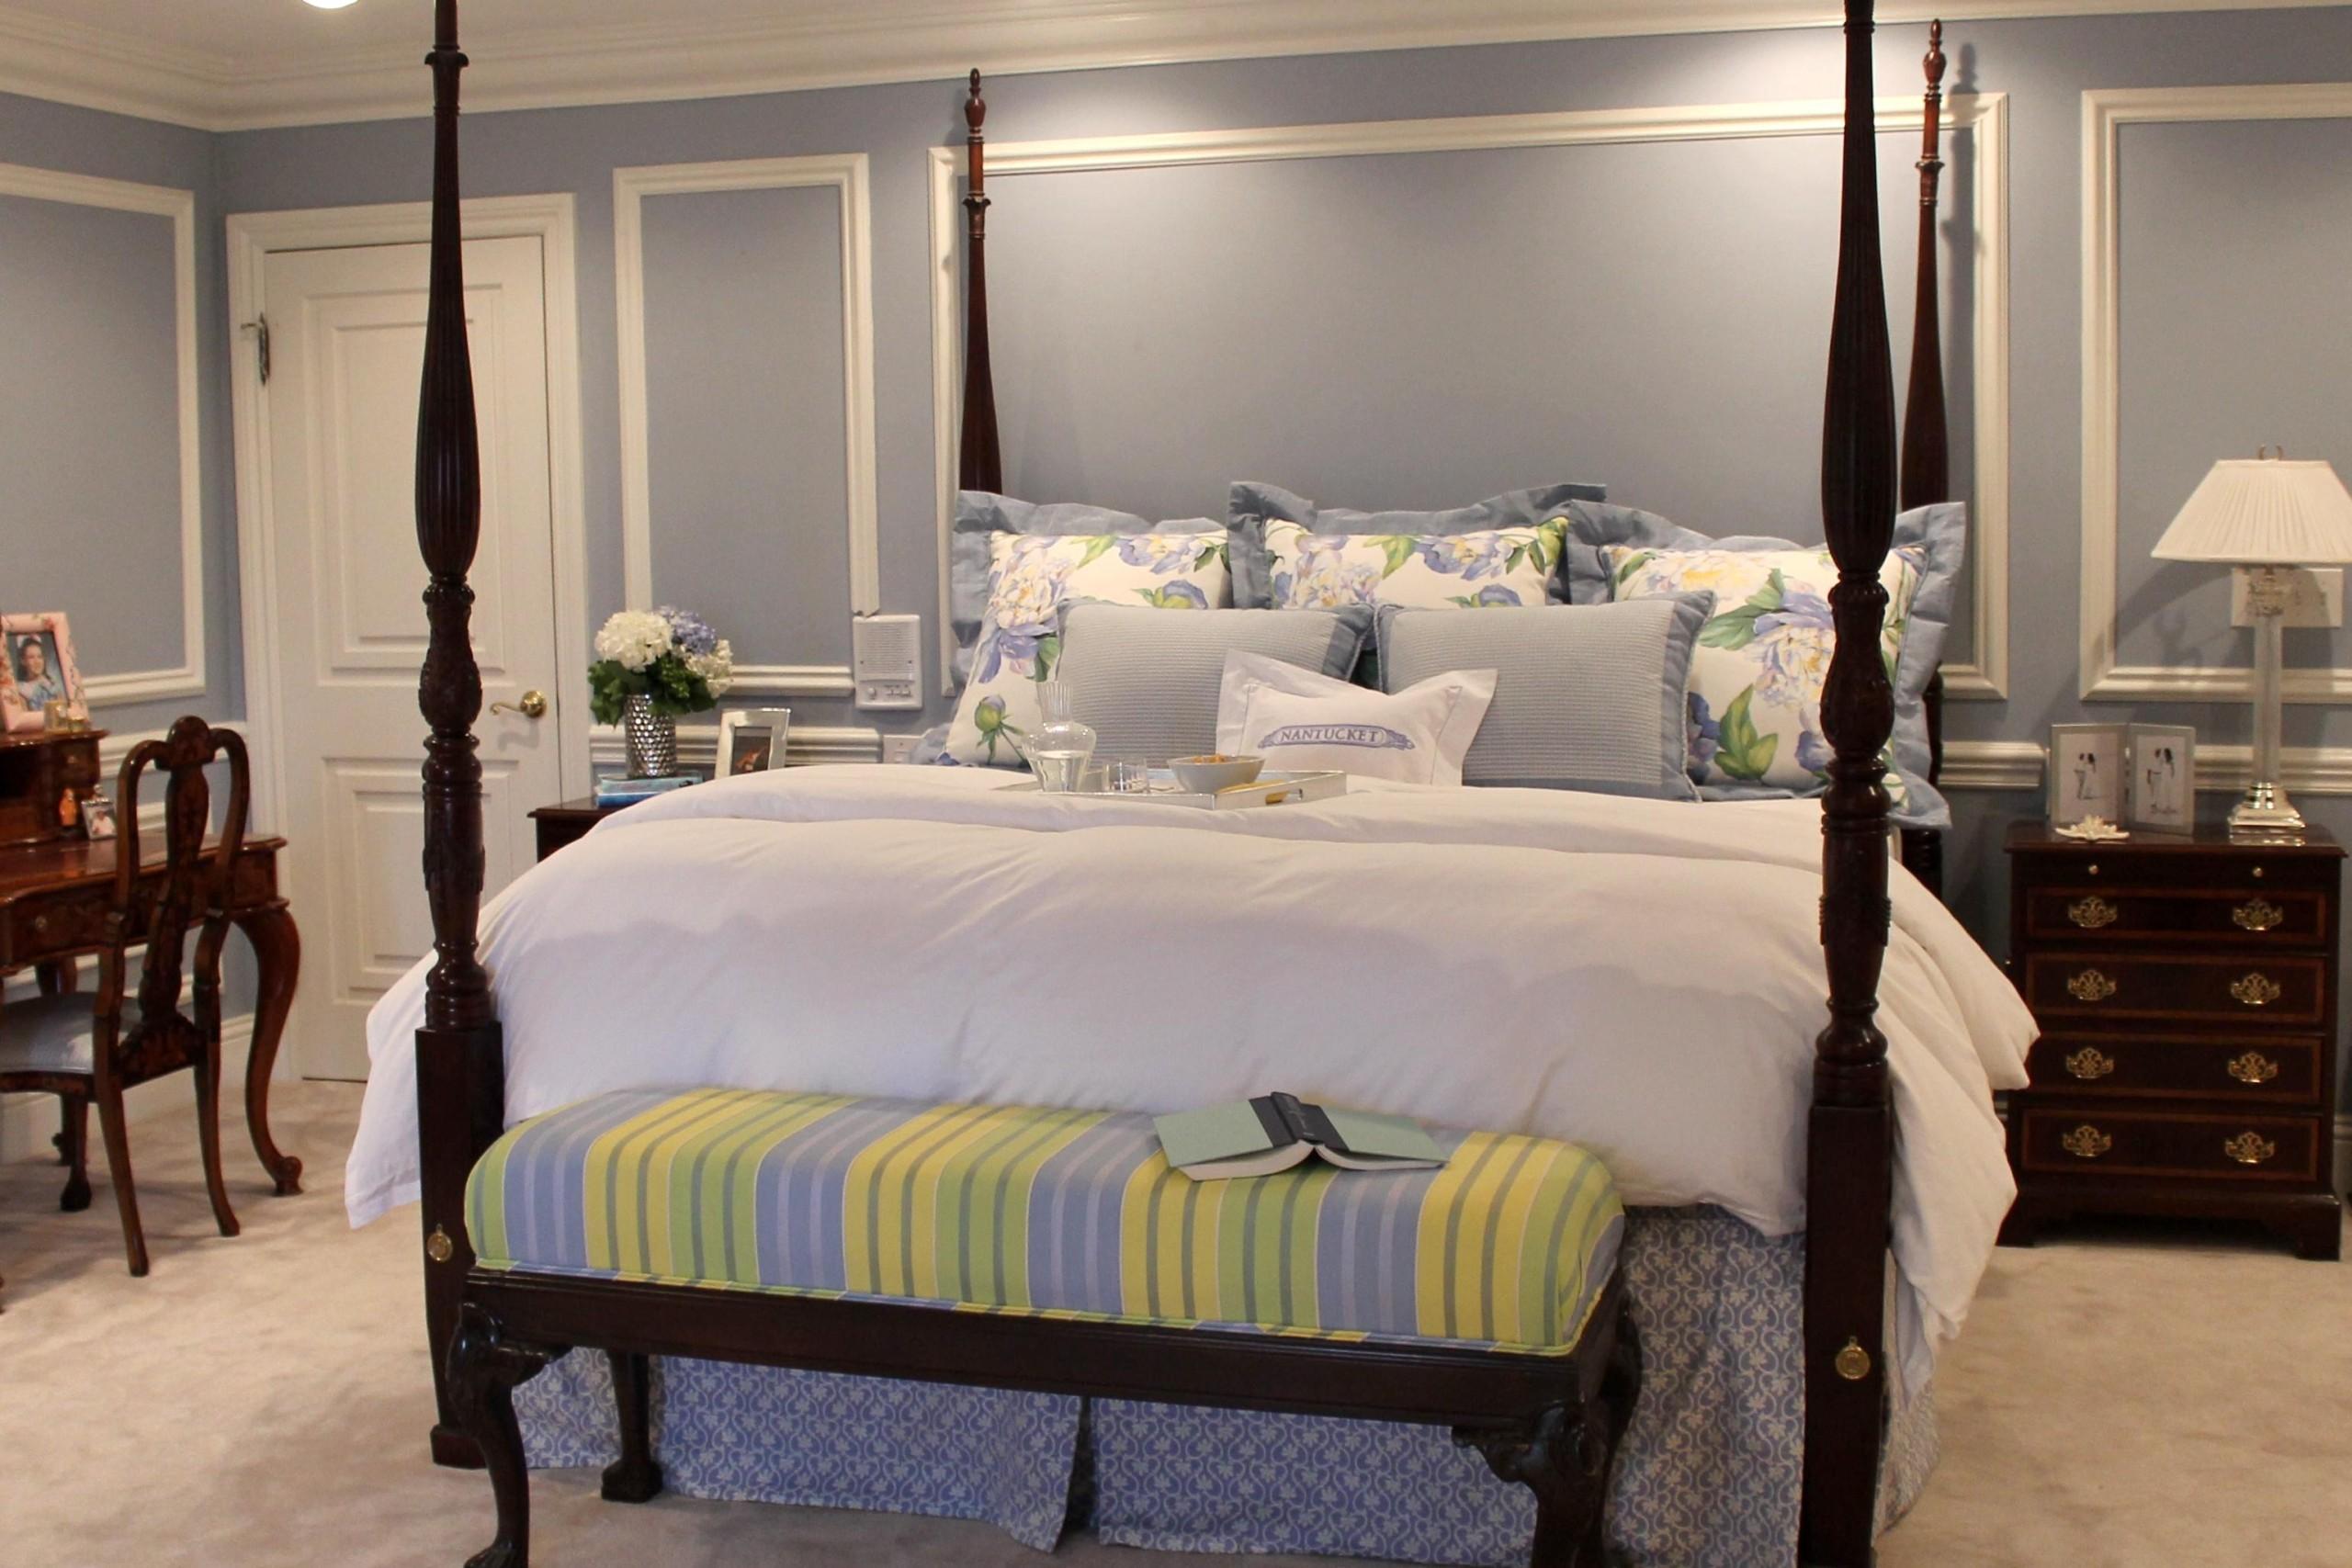 breathtaking romantic bedroom decorating ideas | Traditional romantic bedroom ideas | Hawk Haven